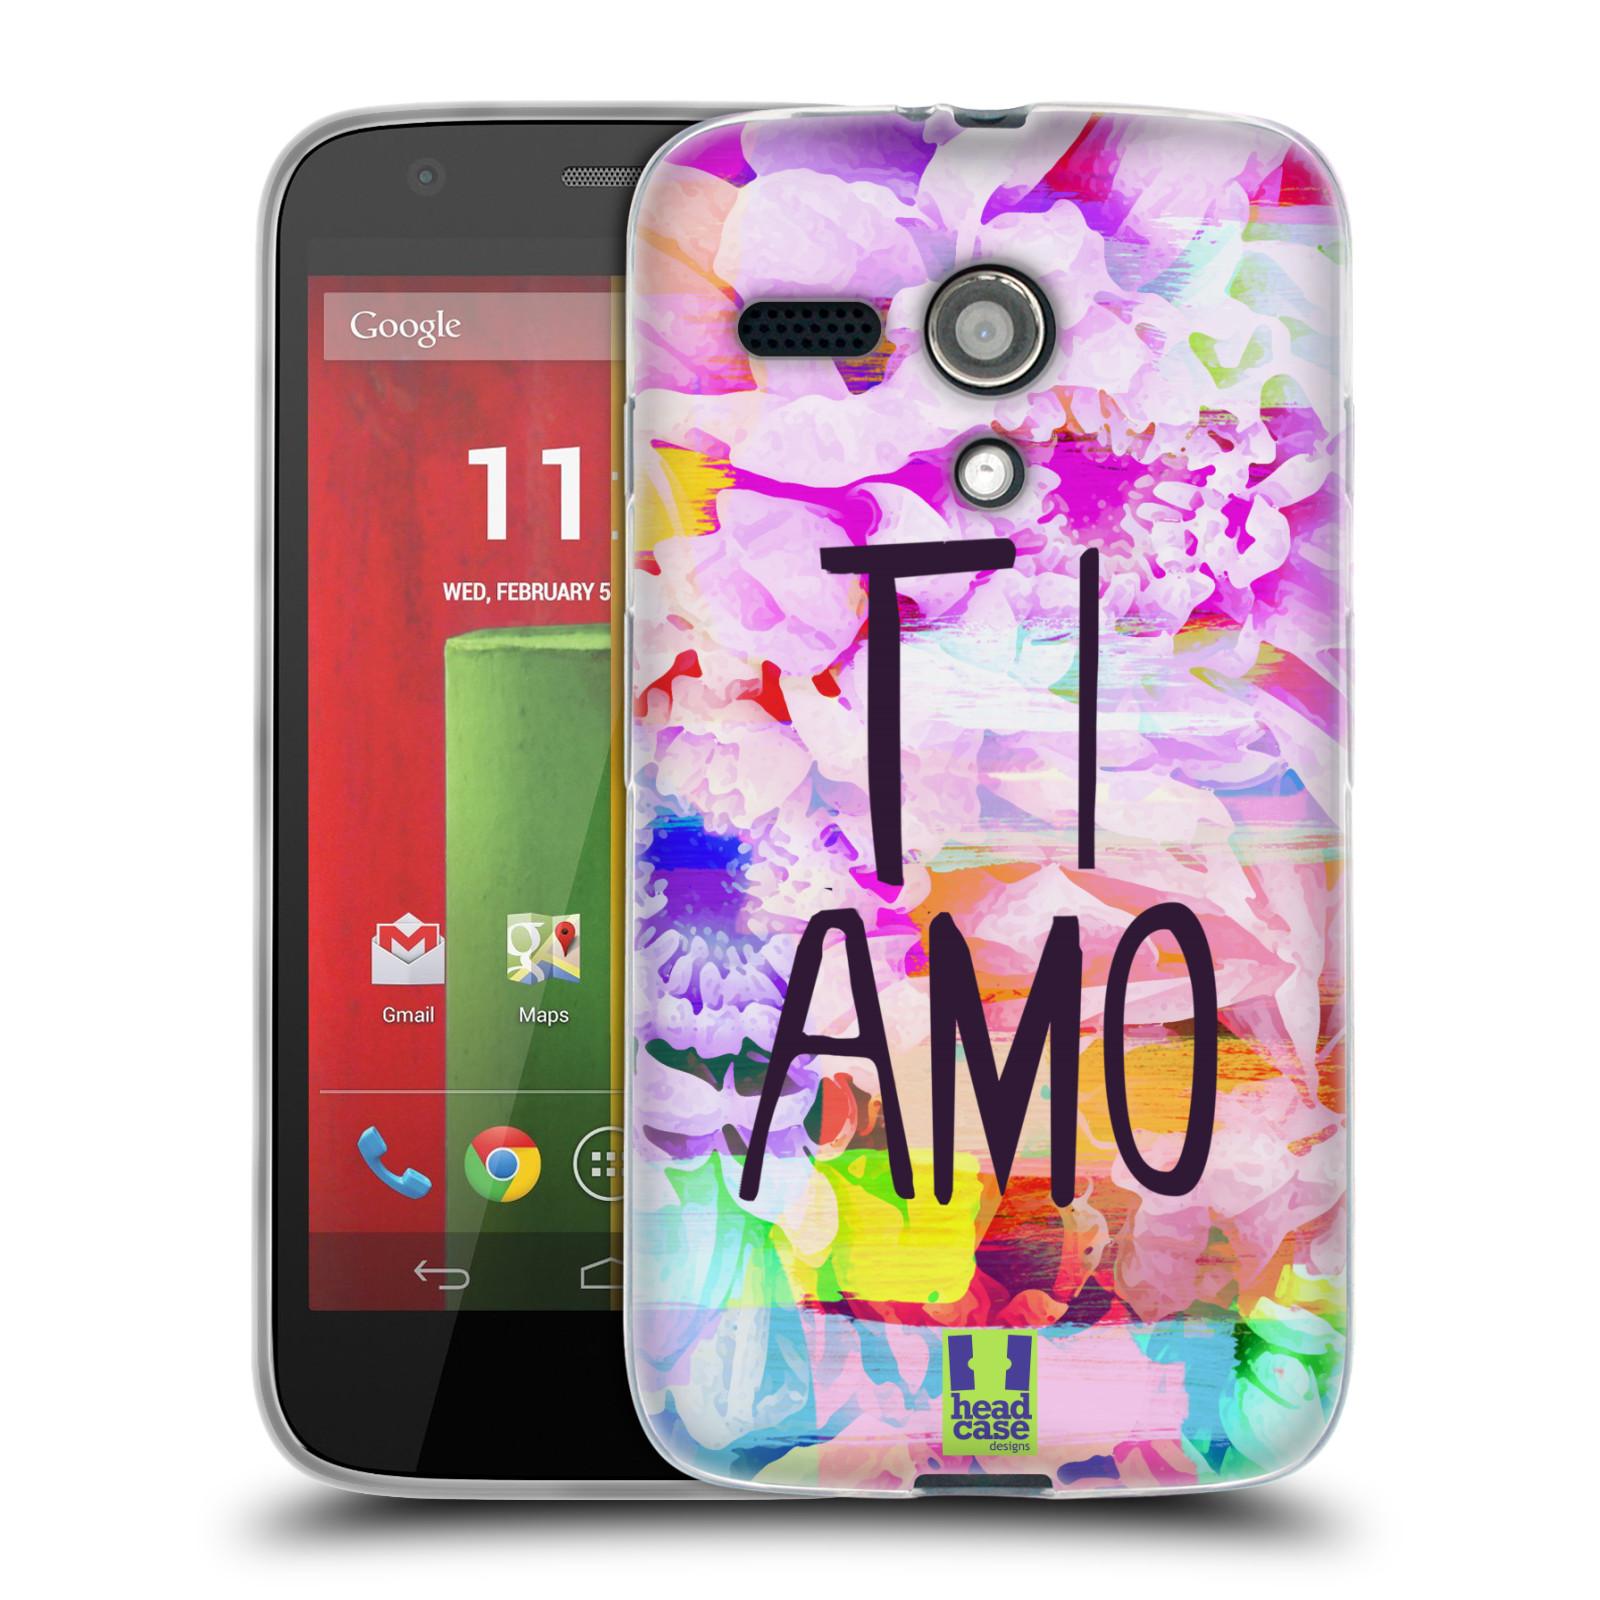 HEAD CASE silikonový obal na mobil Motorola Moto G Láska a květy Ti Amo